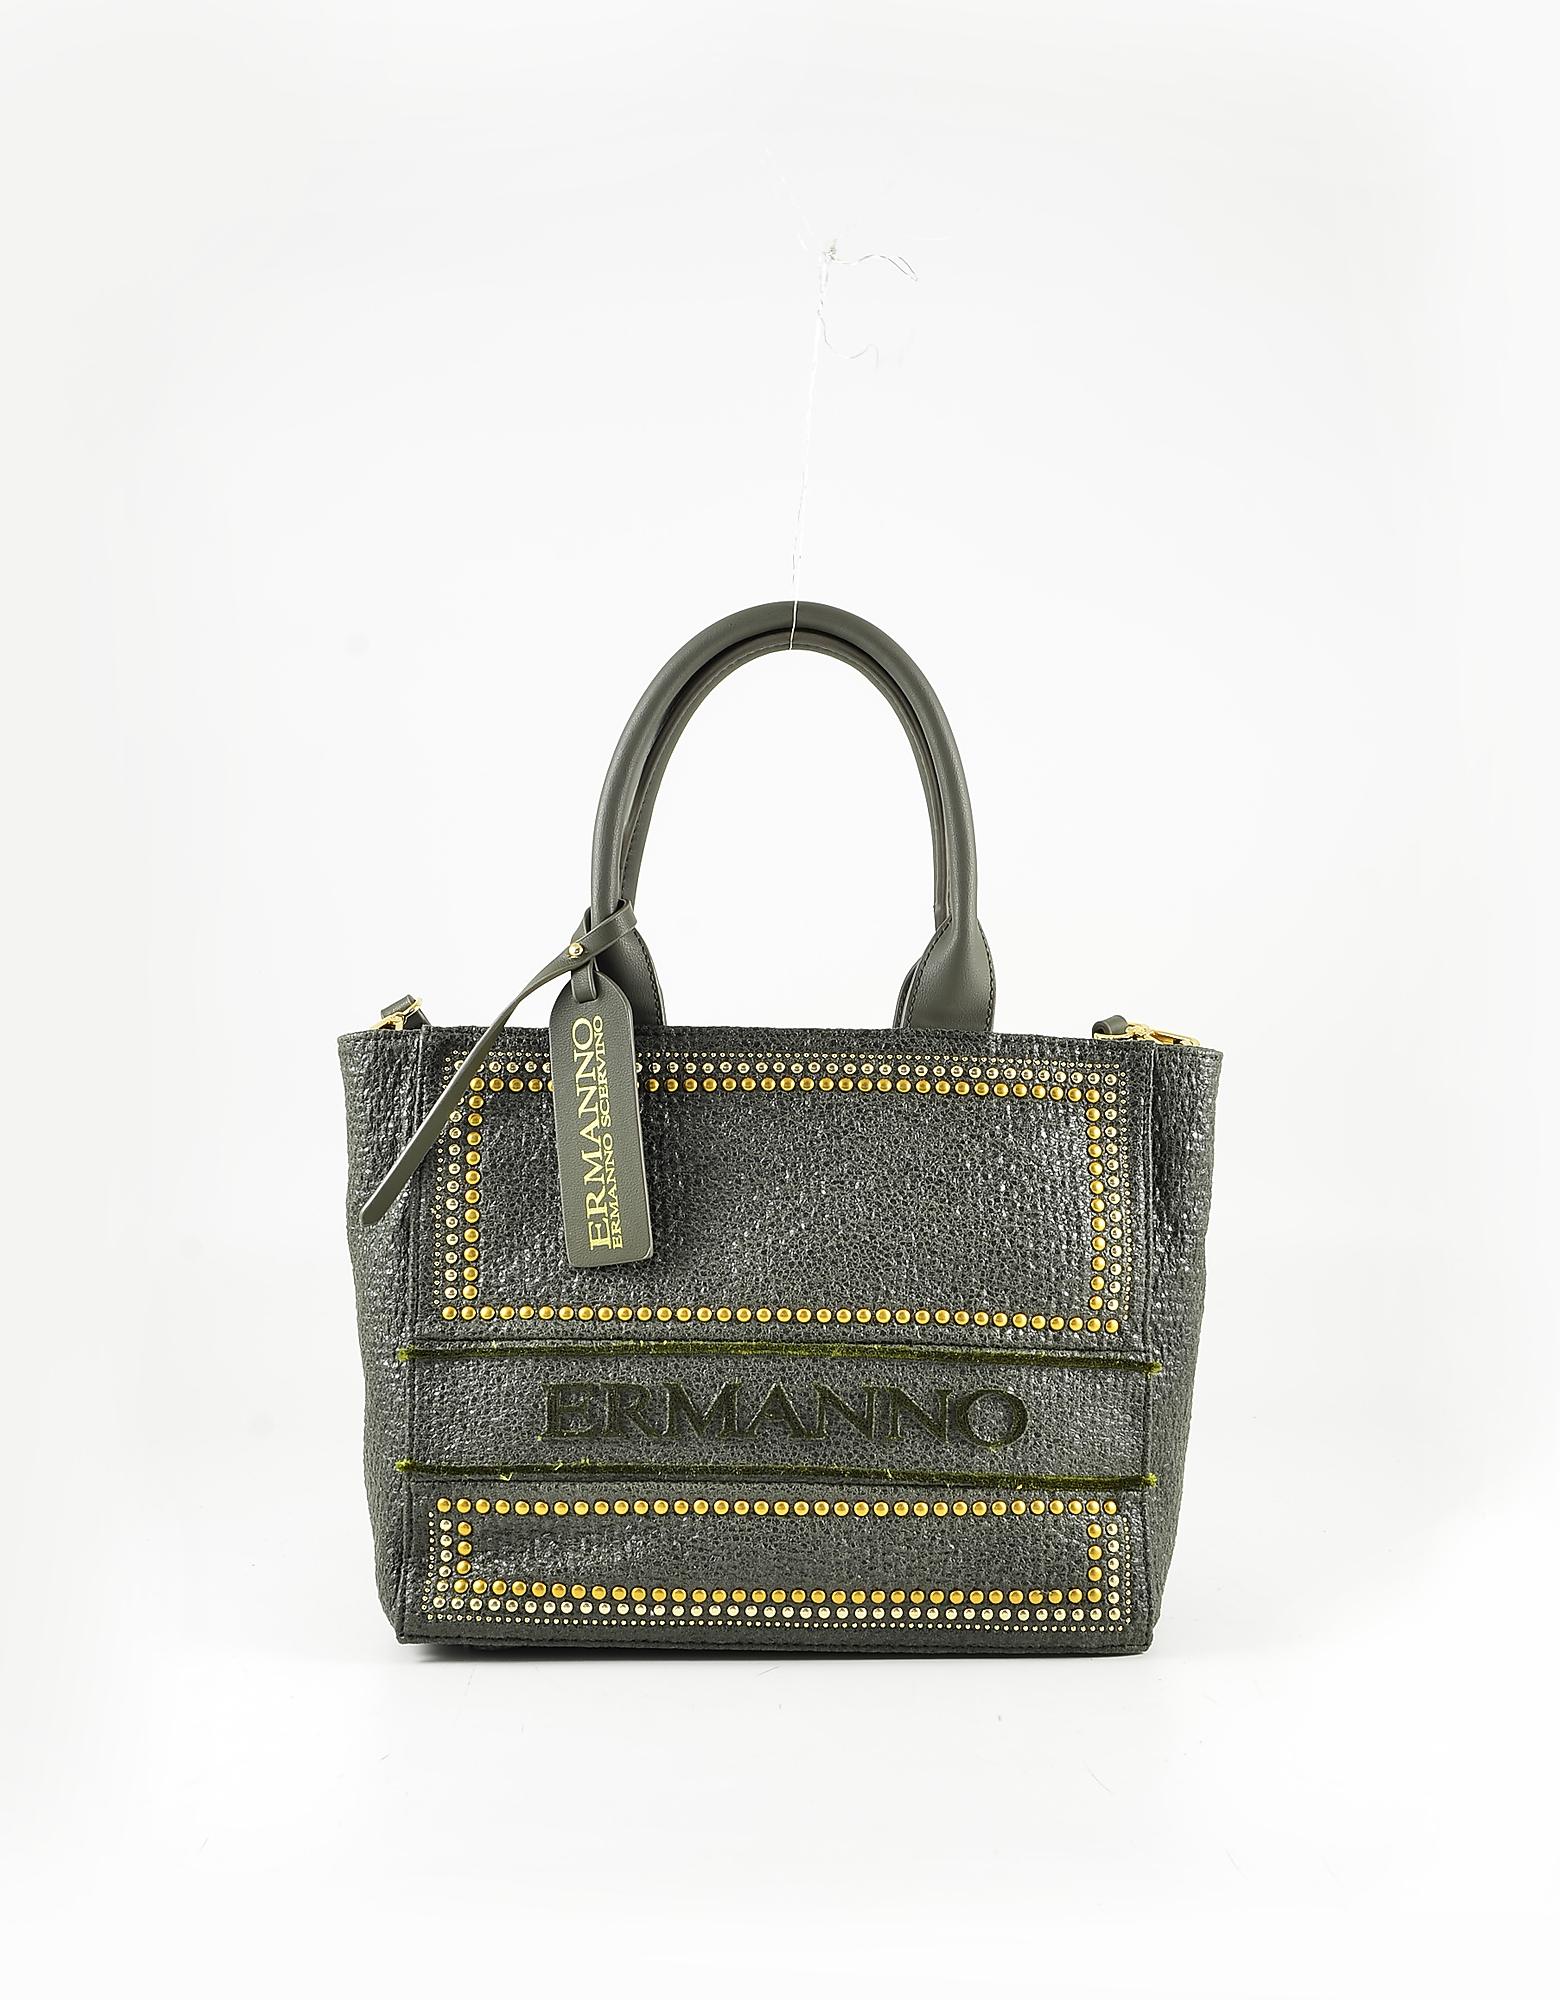 Ermanno Scervino Military Green Eco Leather Small Tote Bag